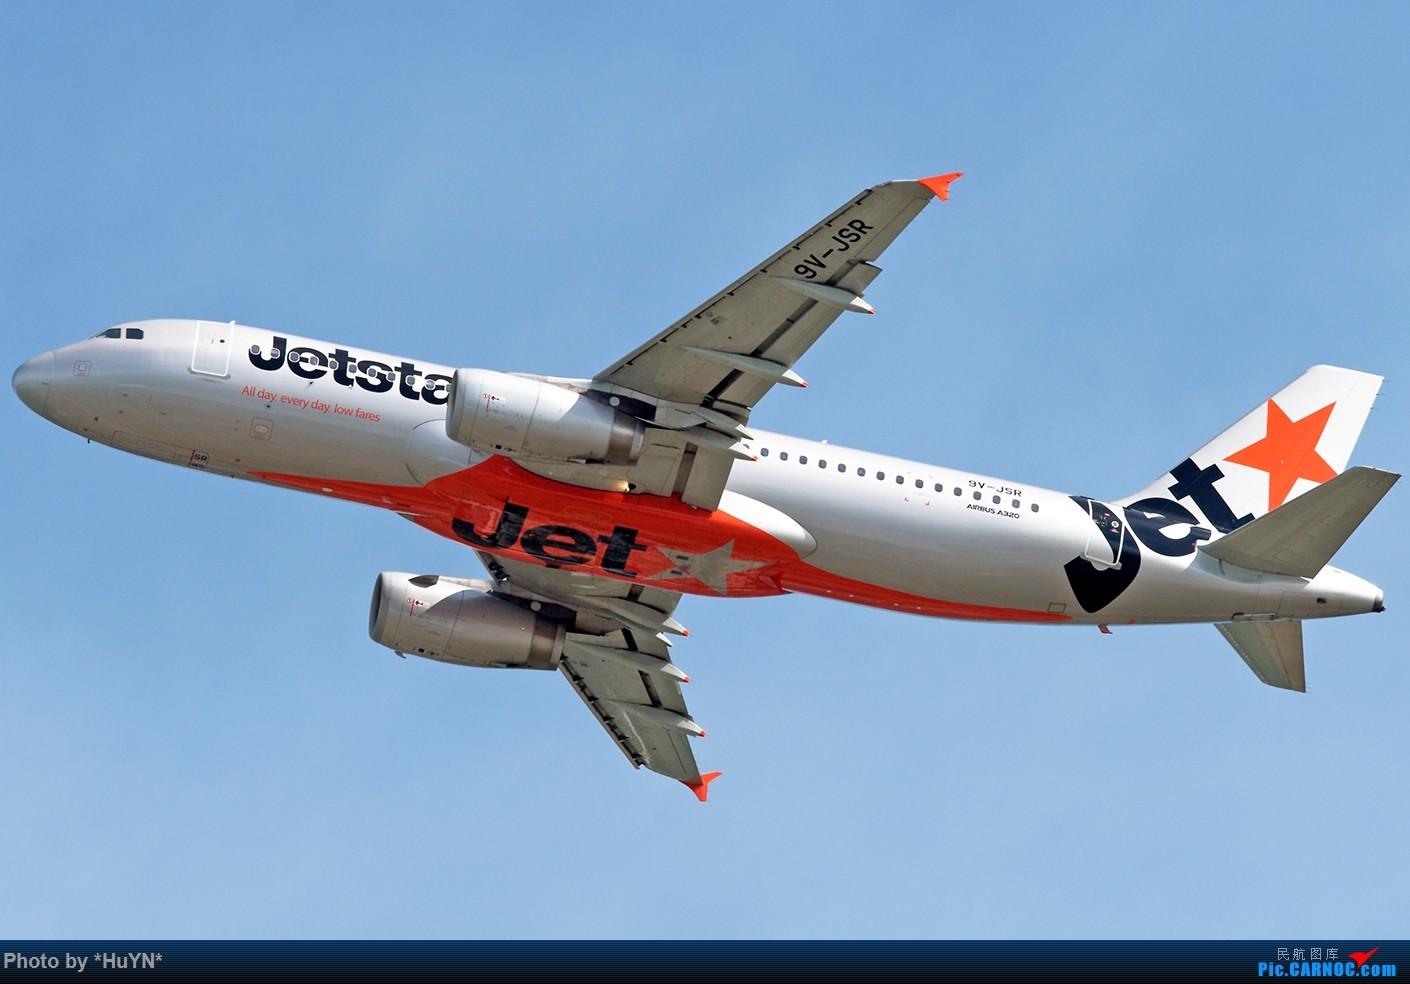 Re:[原创]存货一组(不看后悔) AIRBUS A320 9V-JSR 中国香港赤鱲角国际机场